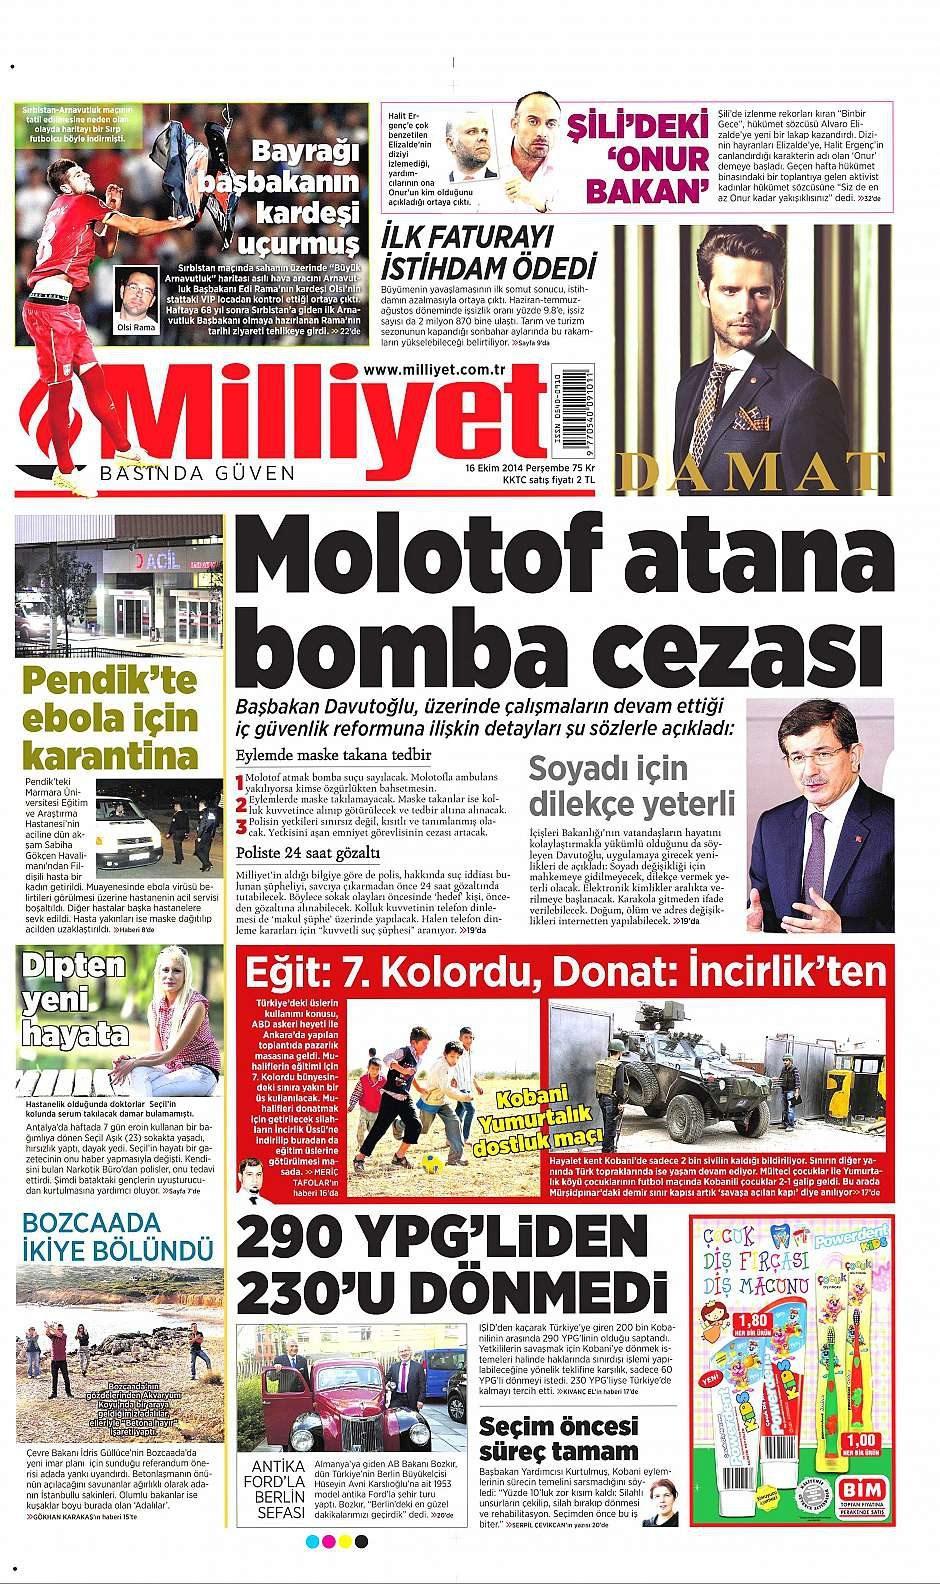 16 Ekim 2014 gazete manşetleri 1